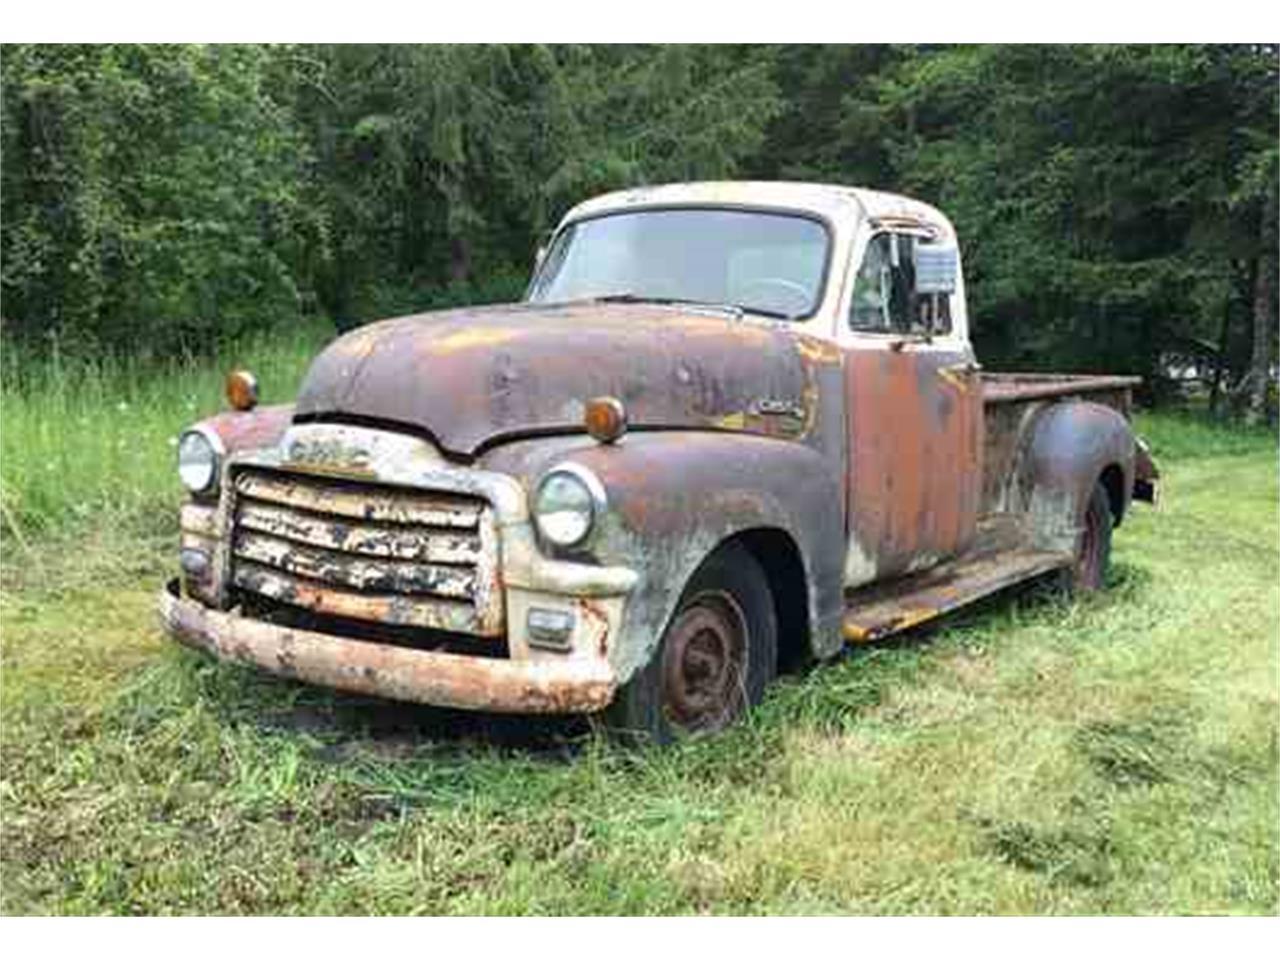 Cancelling Car Insurance >> 1954 GMC Truck for Sale | ClassicCars.com | CC-968187